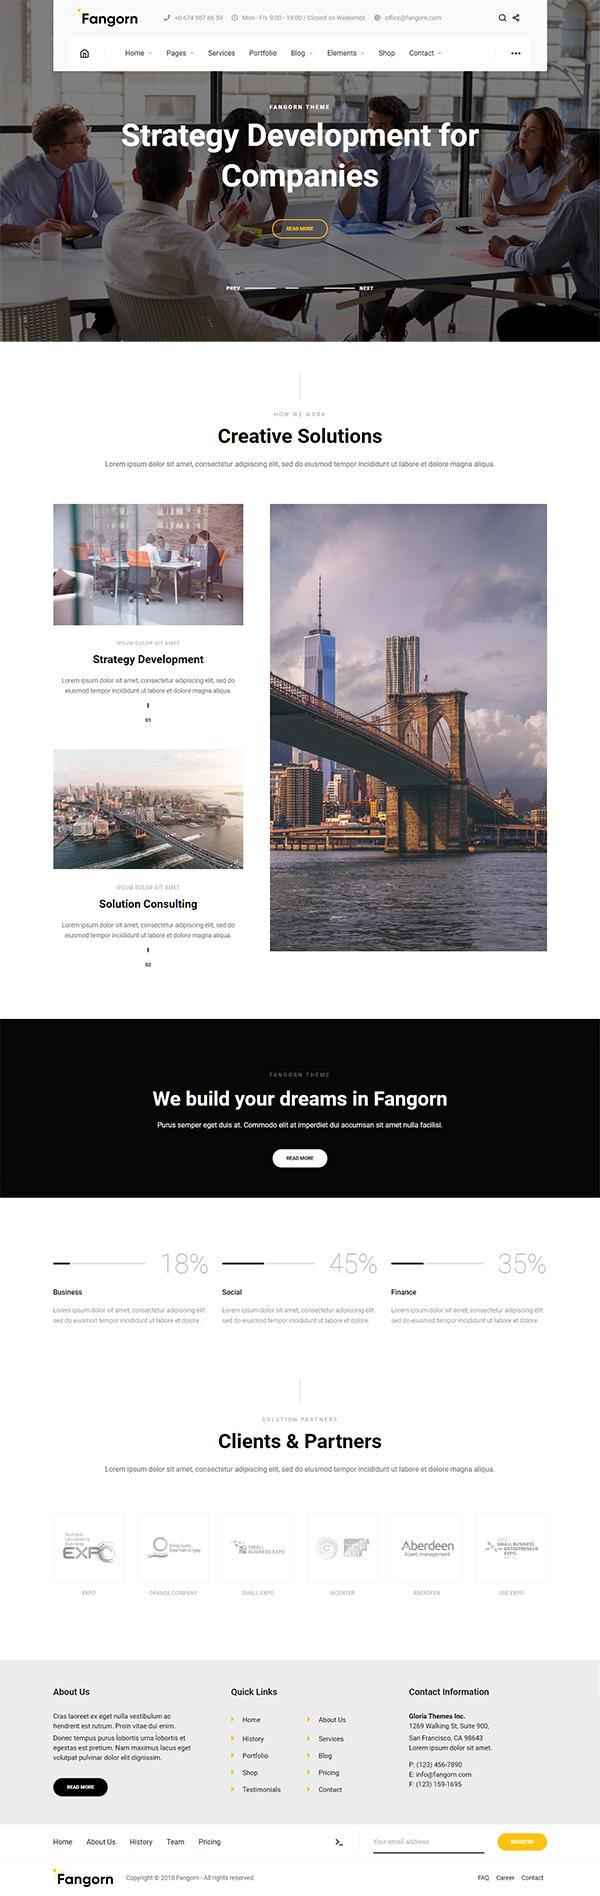 Fangorn - Business & Company WordPress Theme